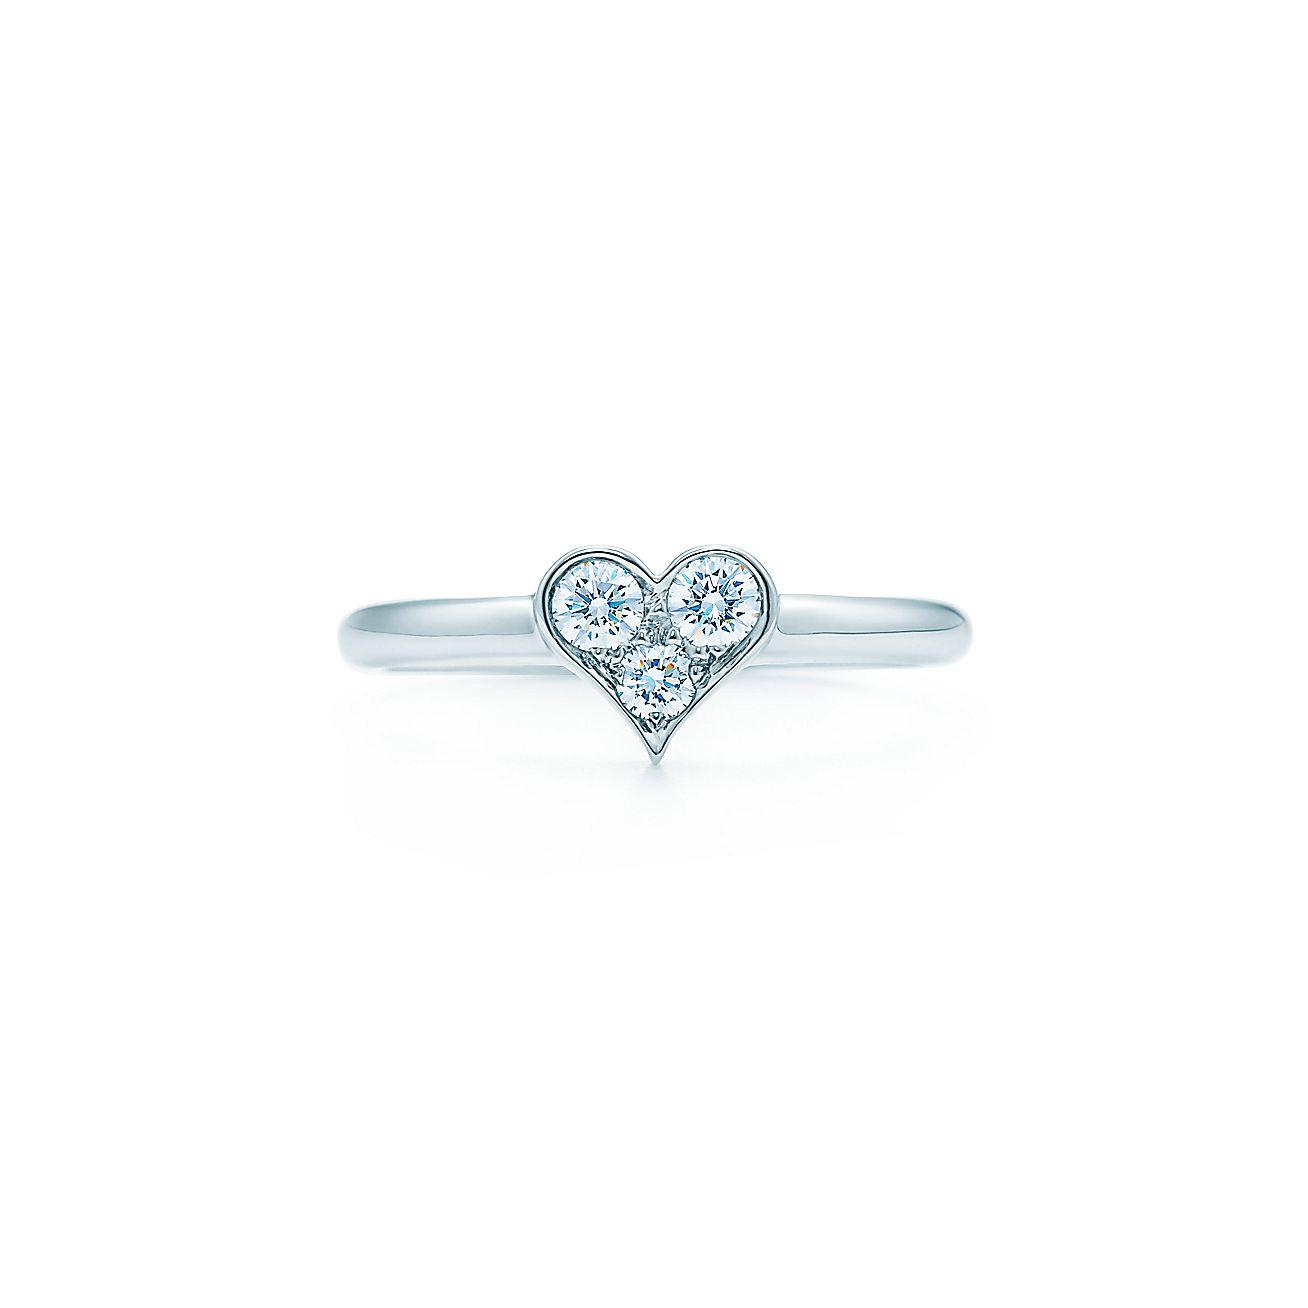 Tiffany Hearts Ring In Platinum With Diamonds Tiffany Co